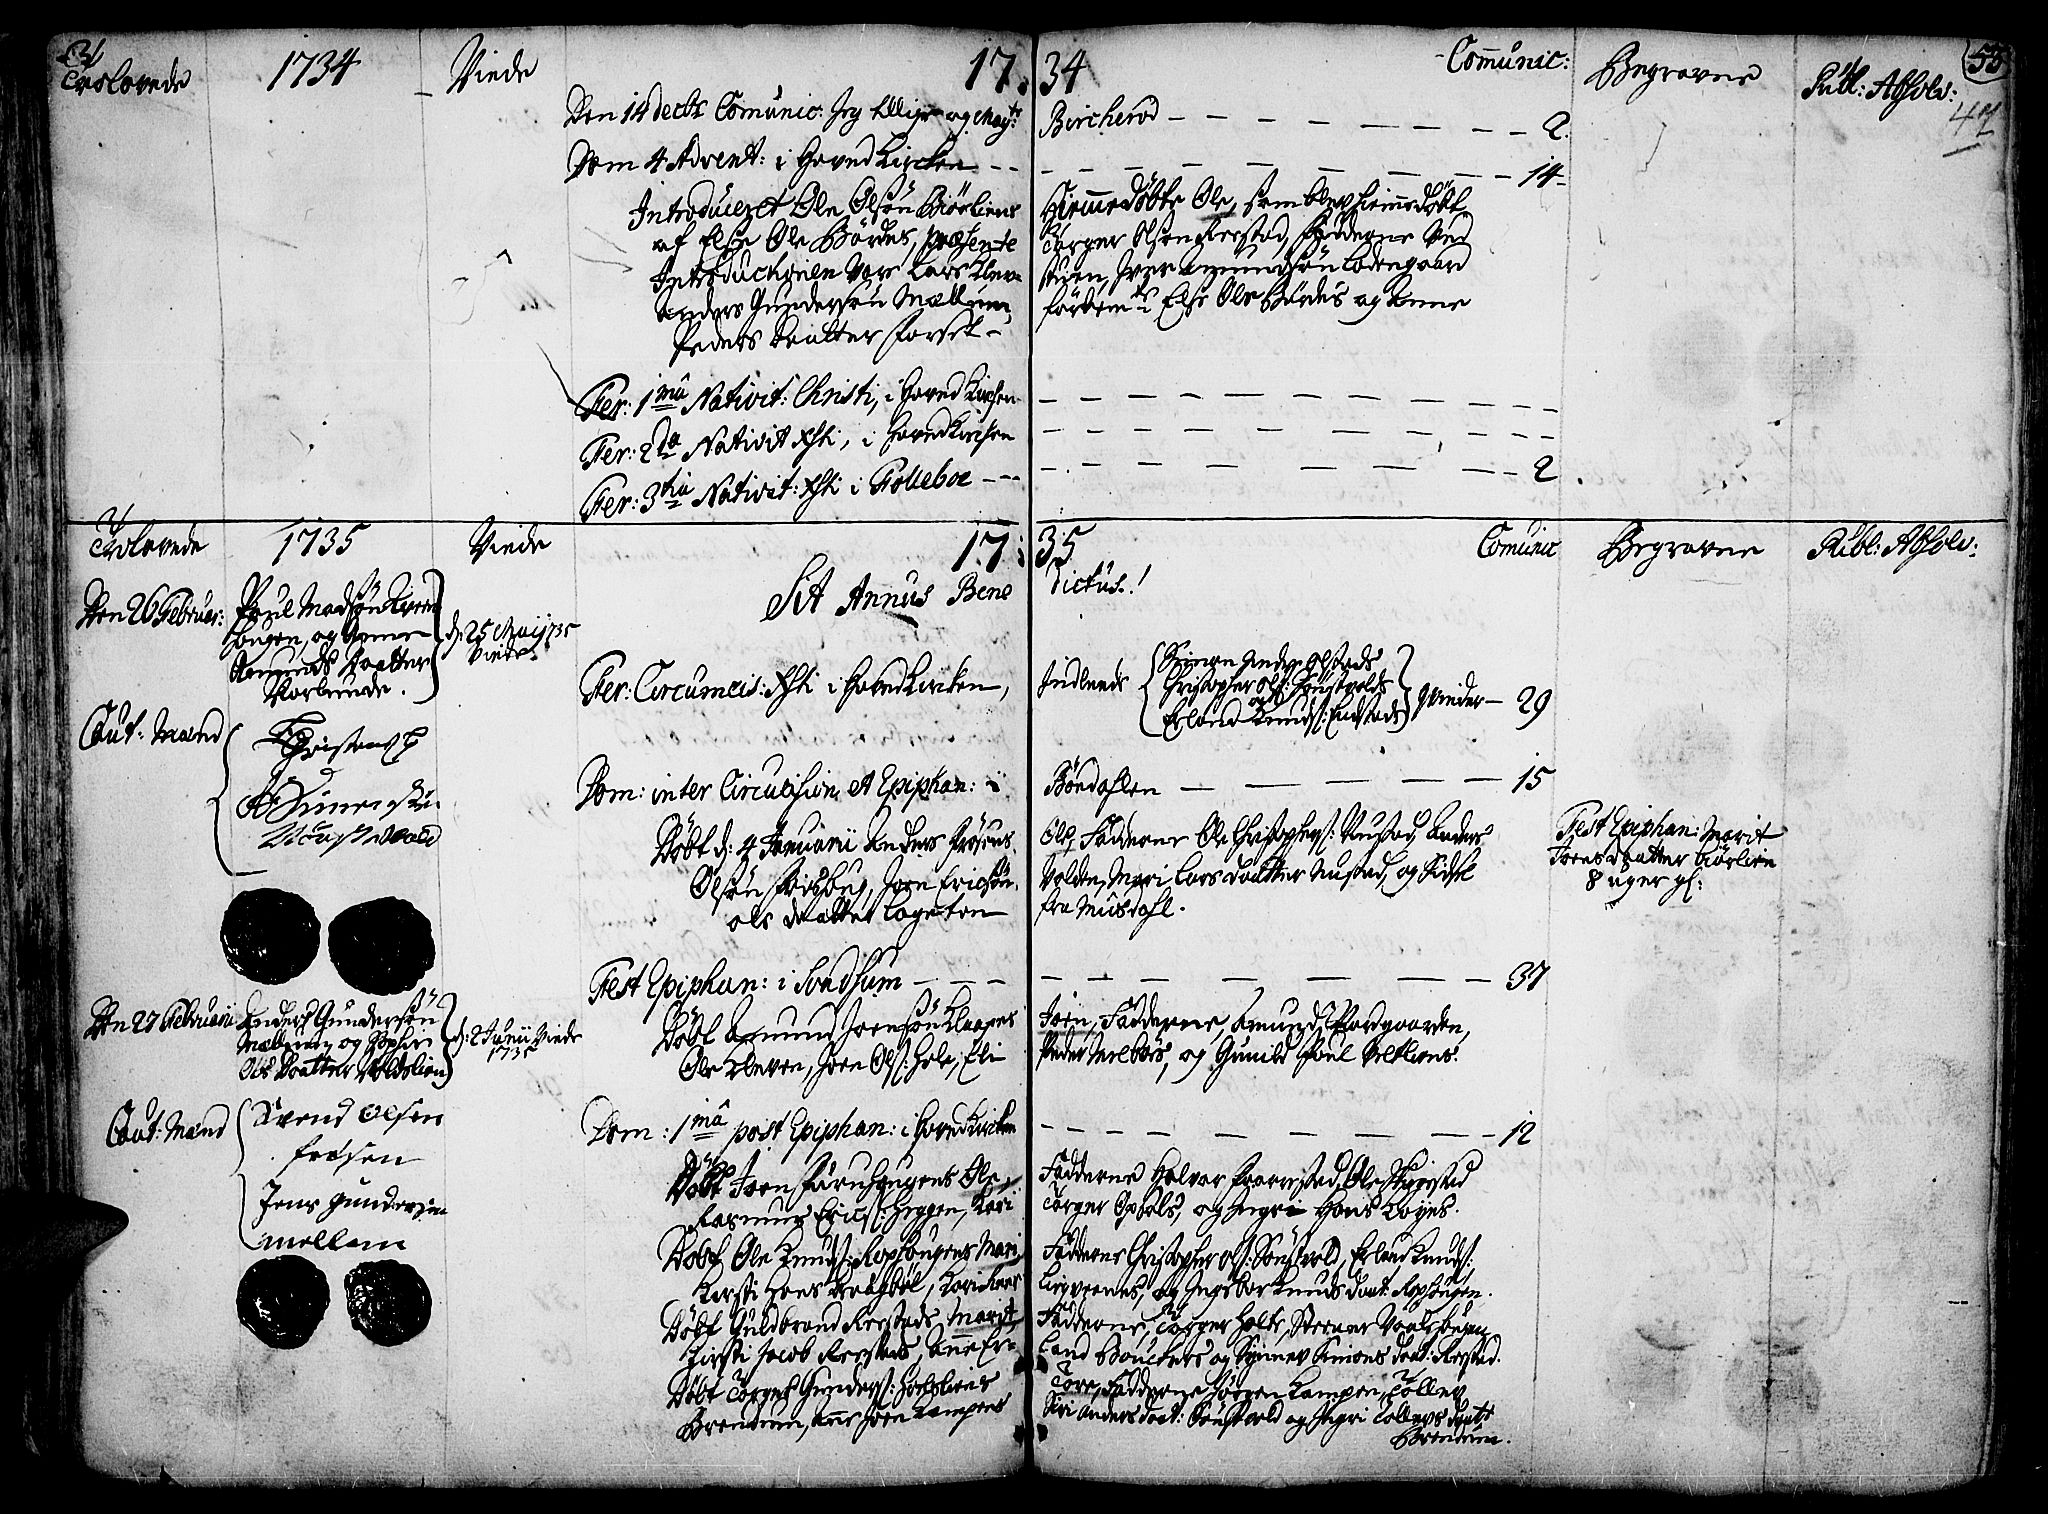 SAH, Gausdal prestekontor, Ministerialbok nr. 2, 1729-1757, s. 47